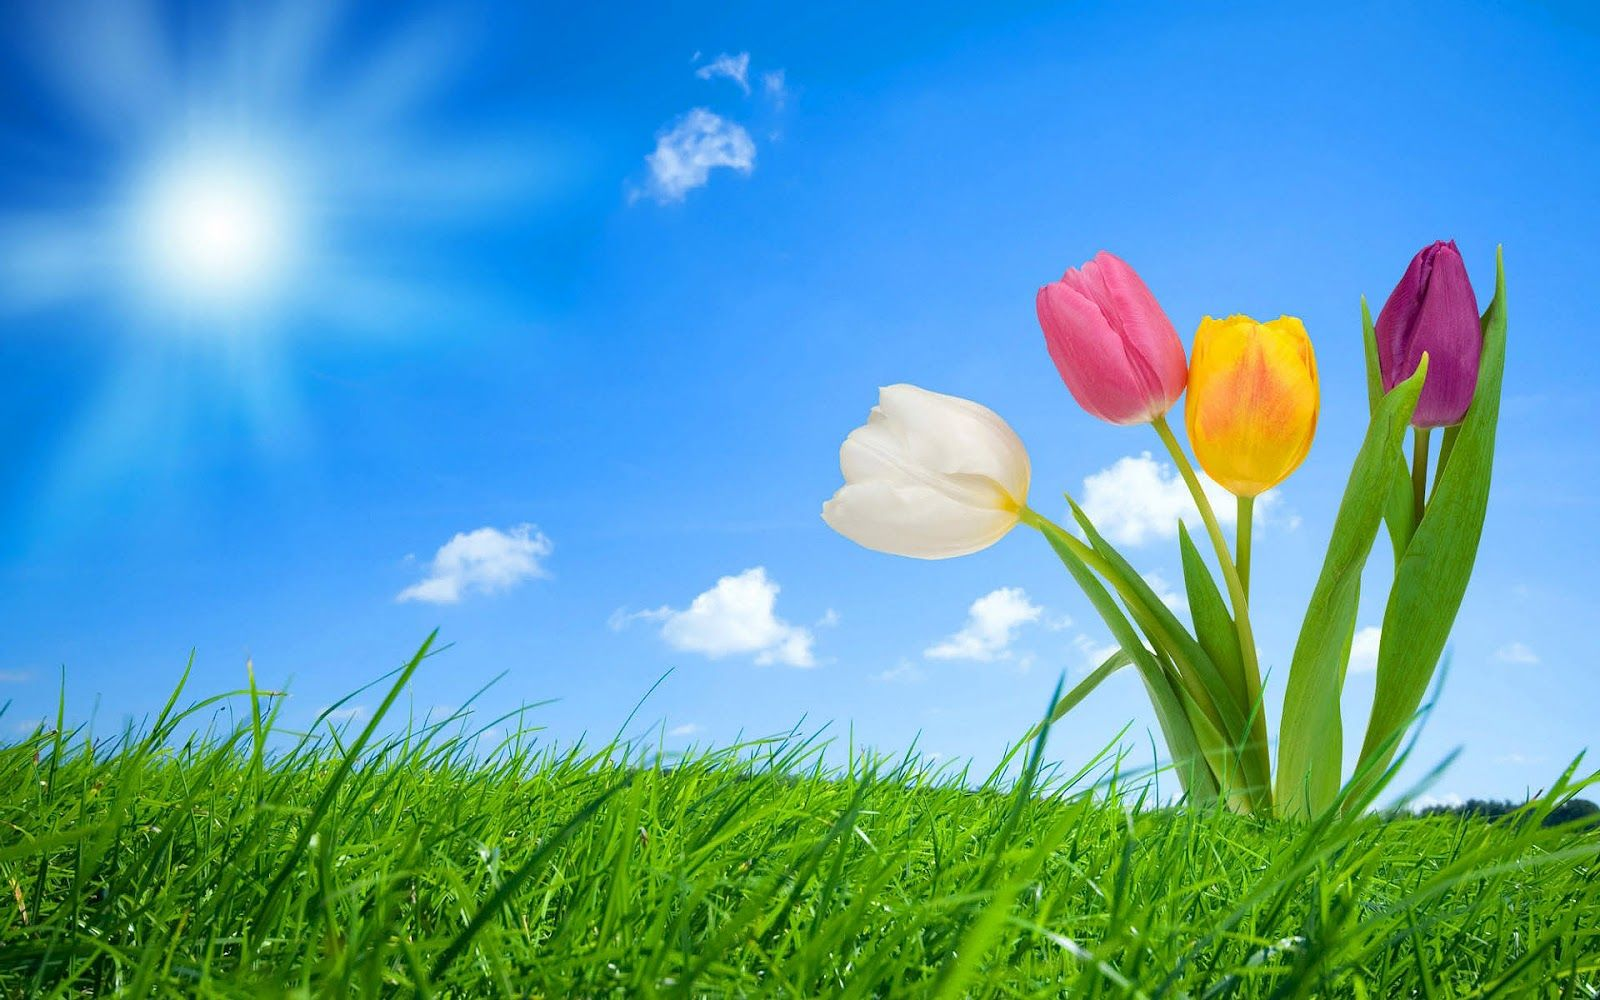 Spring Hd